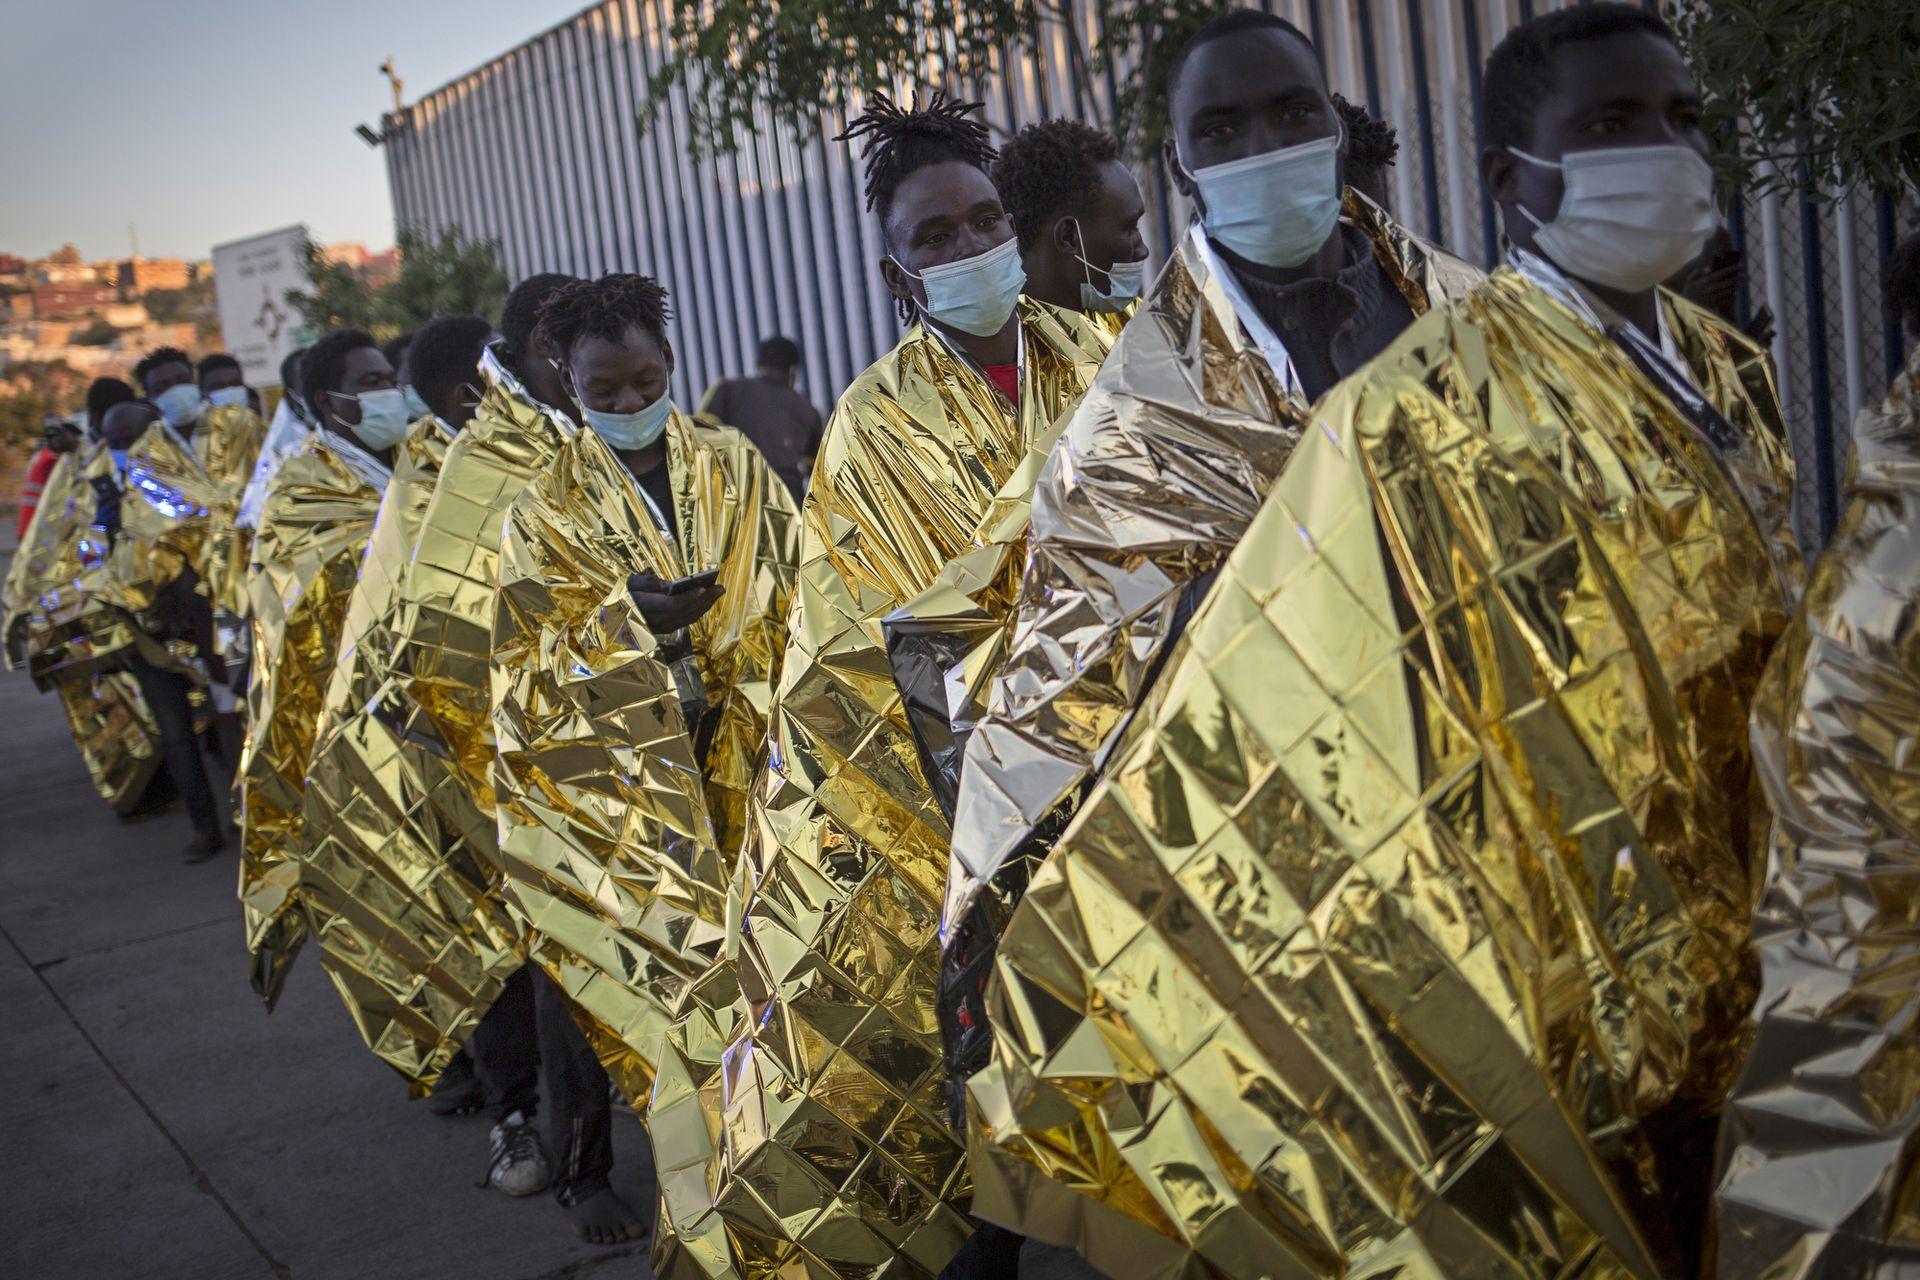 Un grupo de migrantes camina envueltos en mantas térmicas en un centro de detención para migrantes